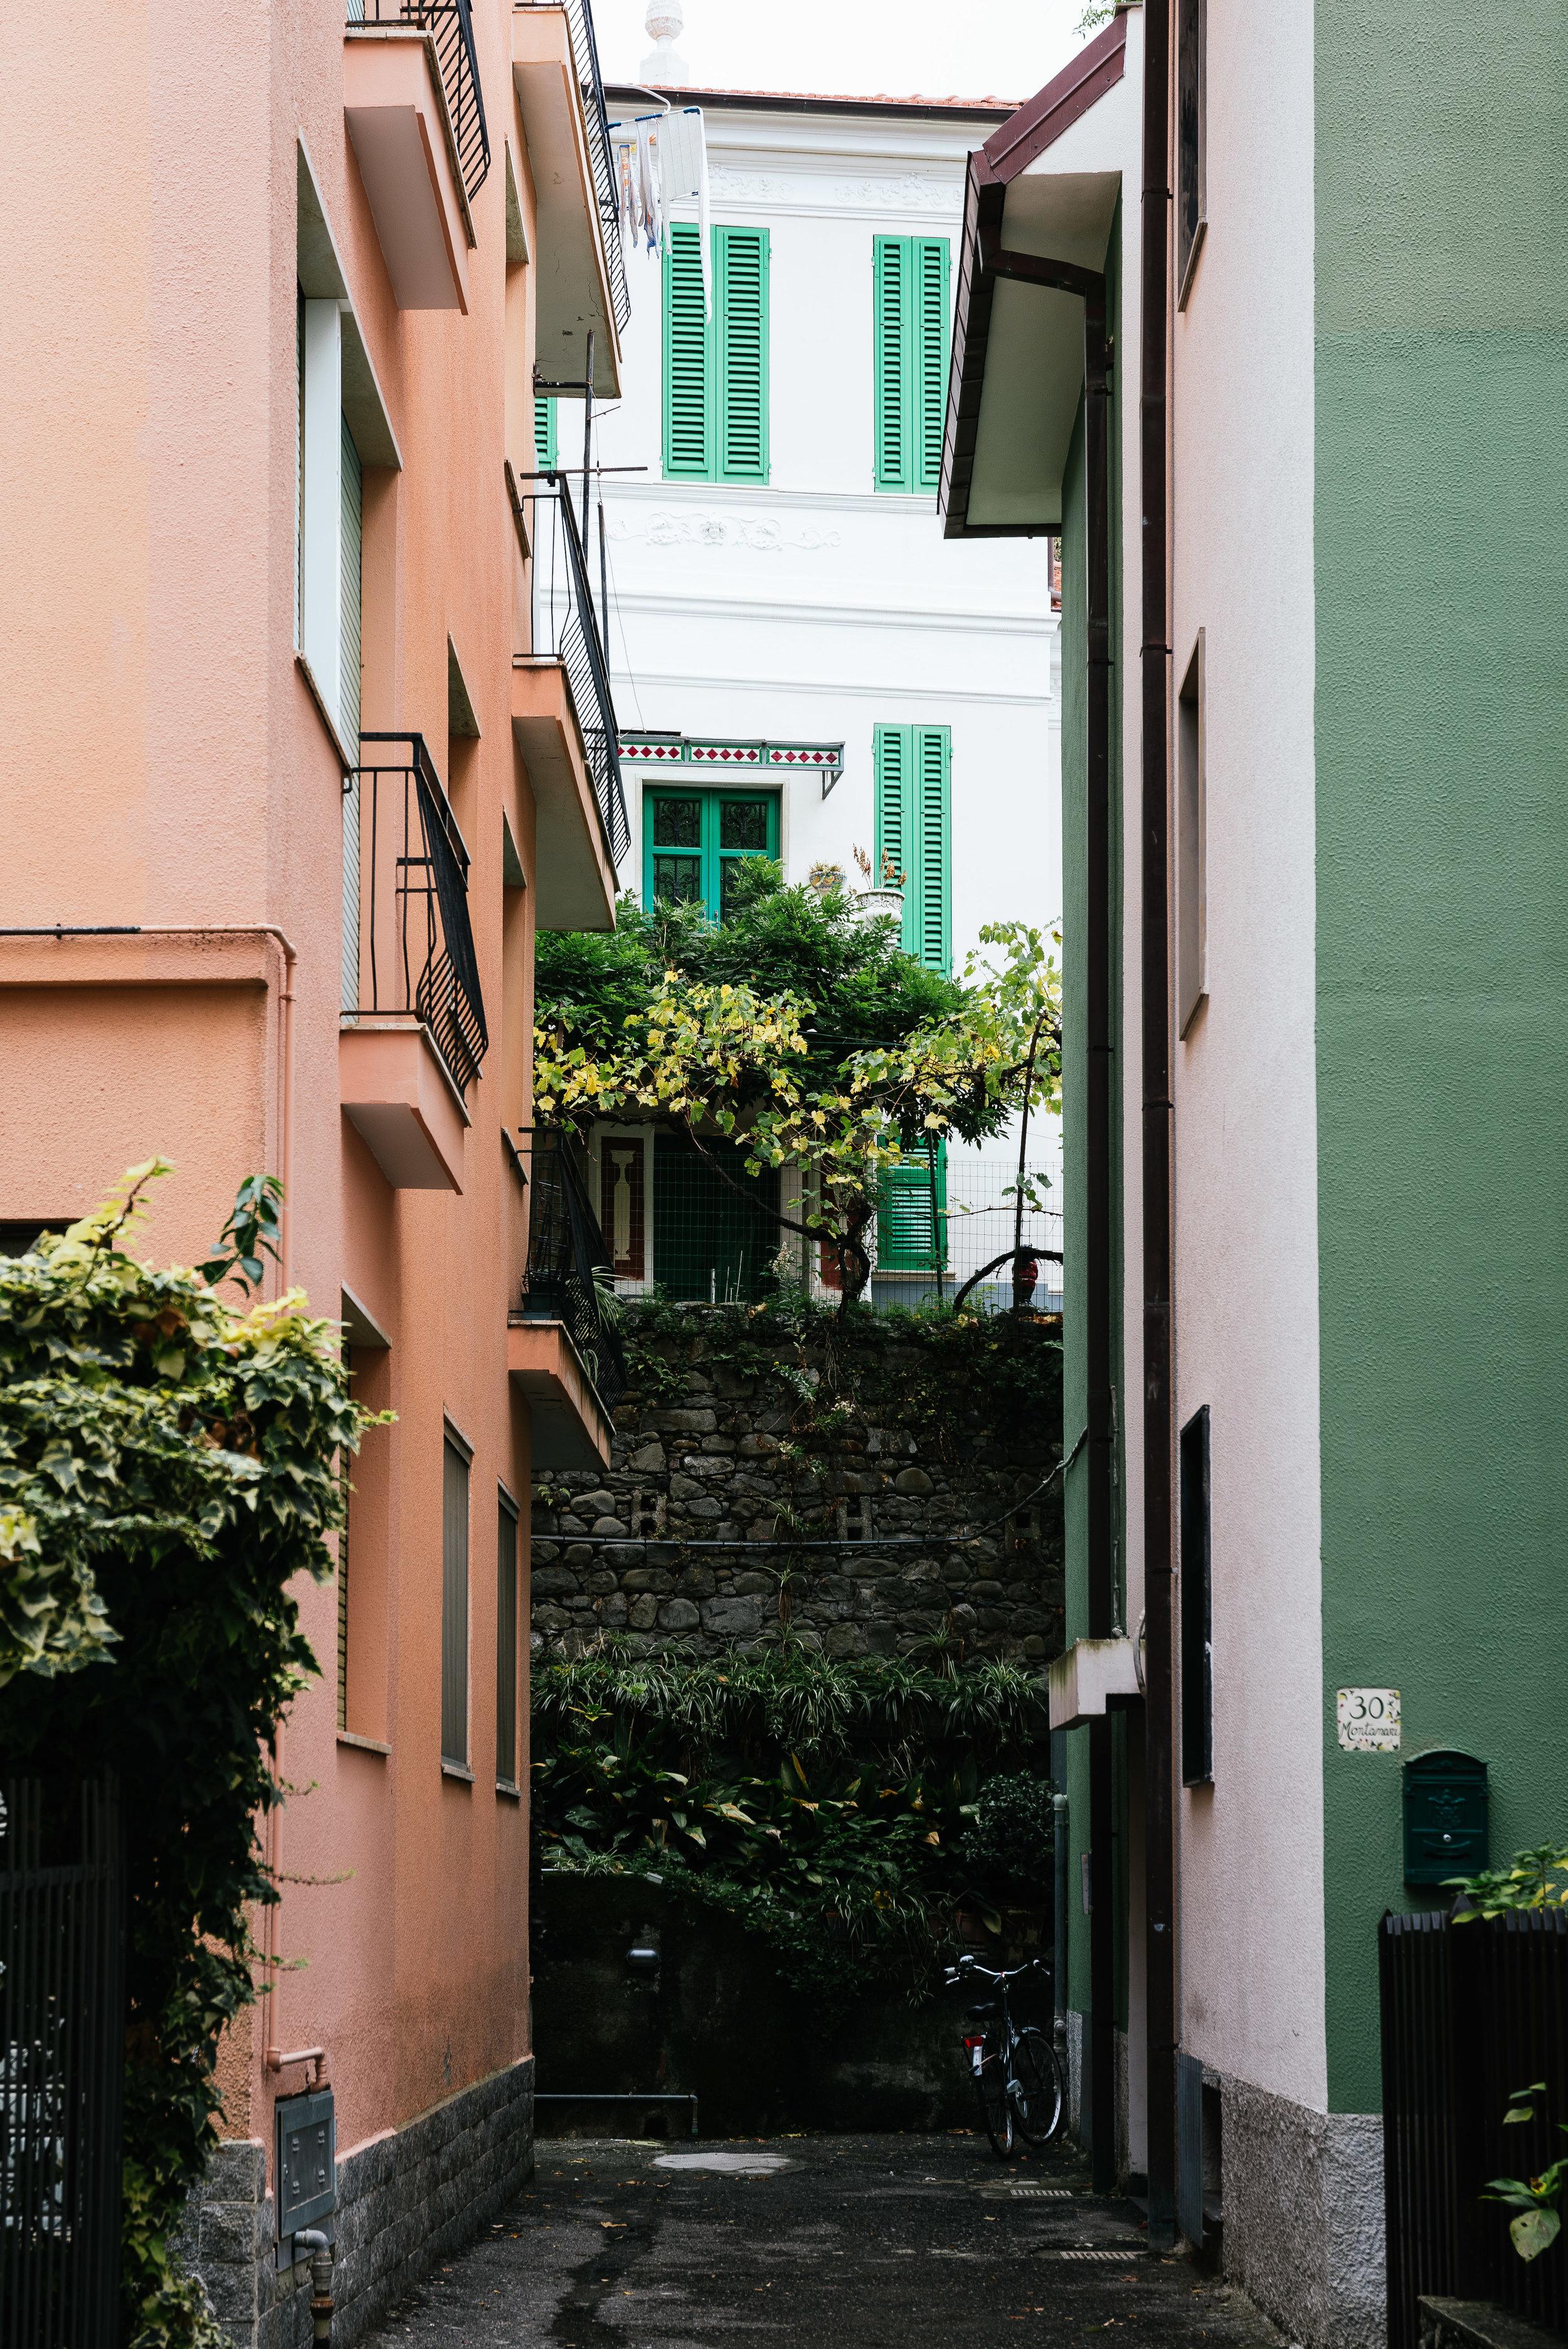 Vernazza Alleyway.jpg